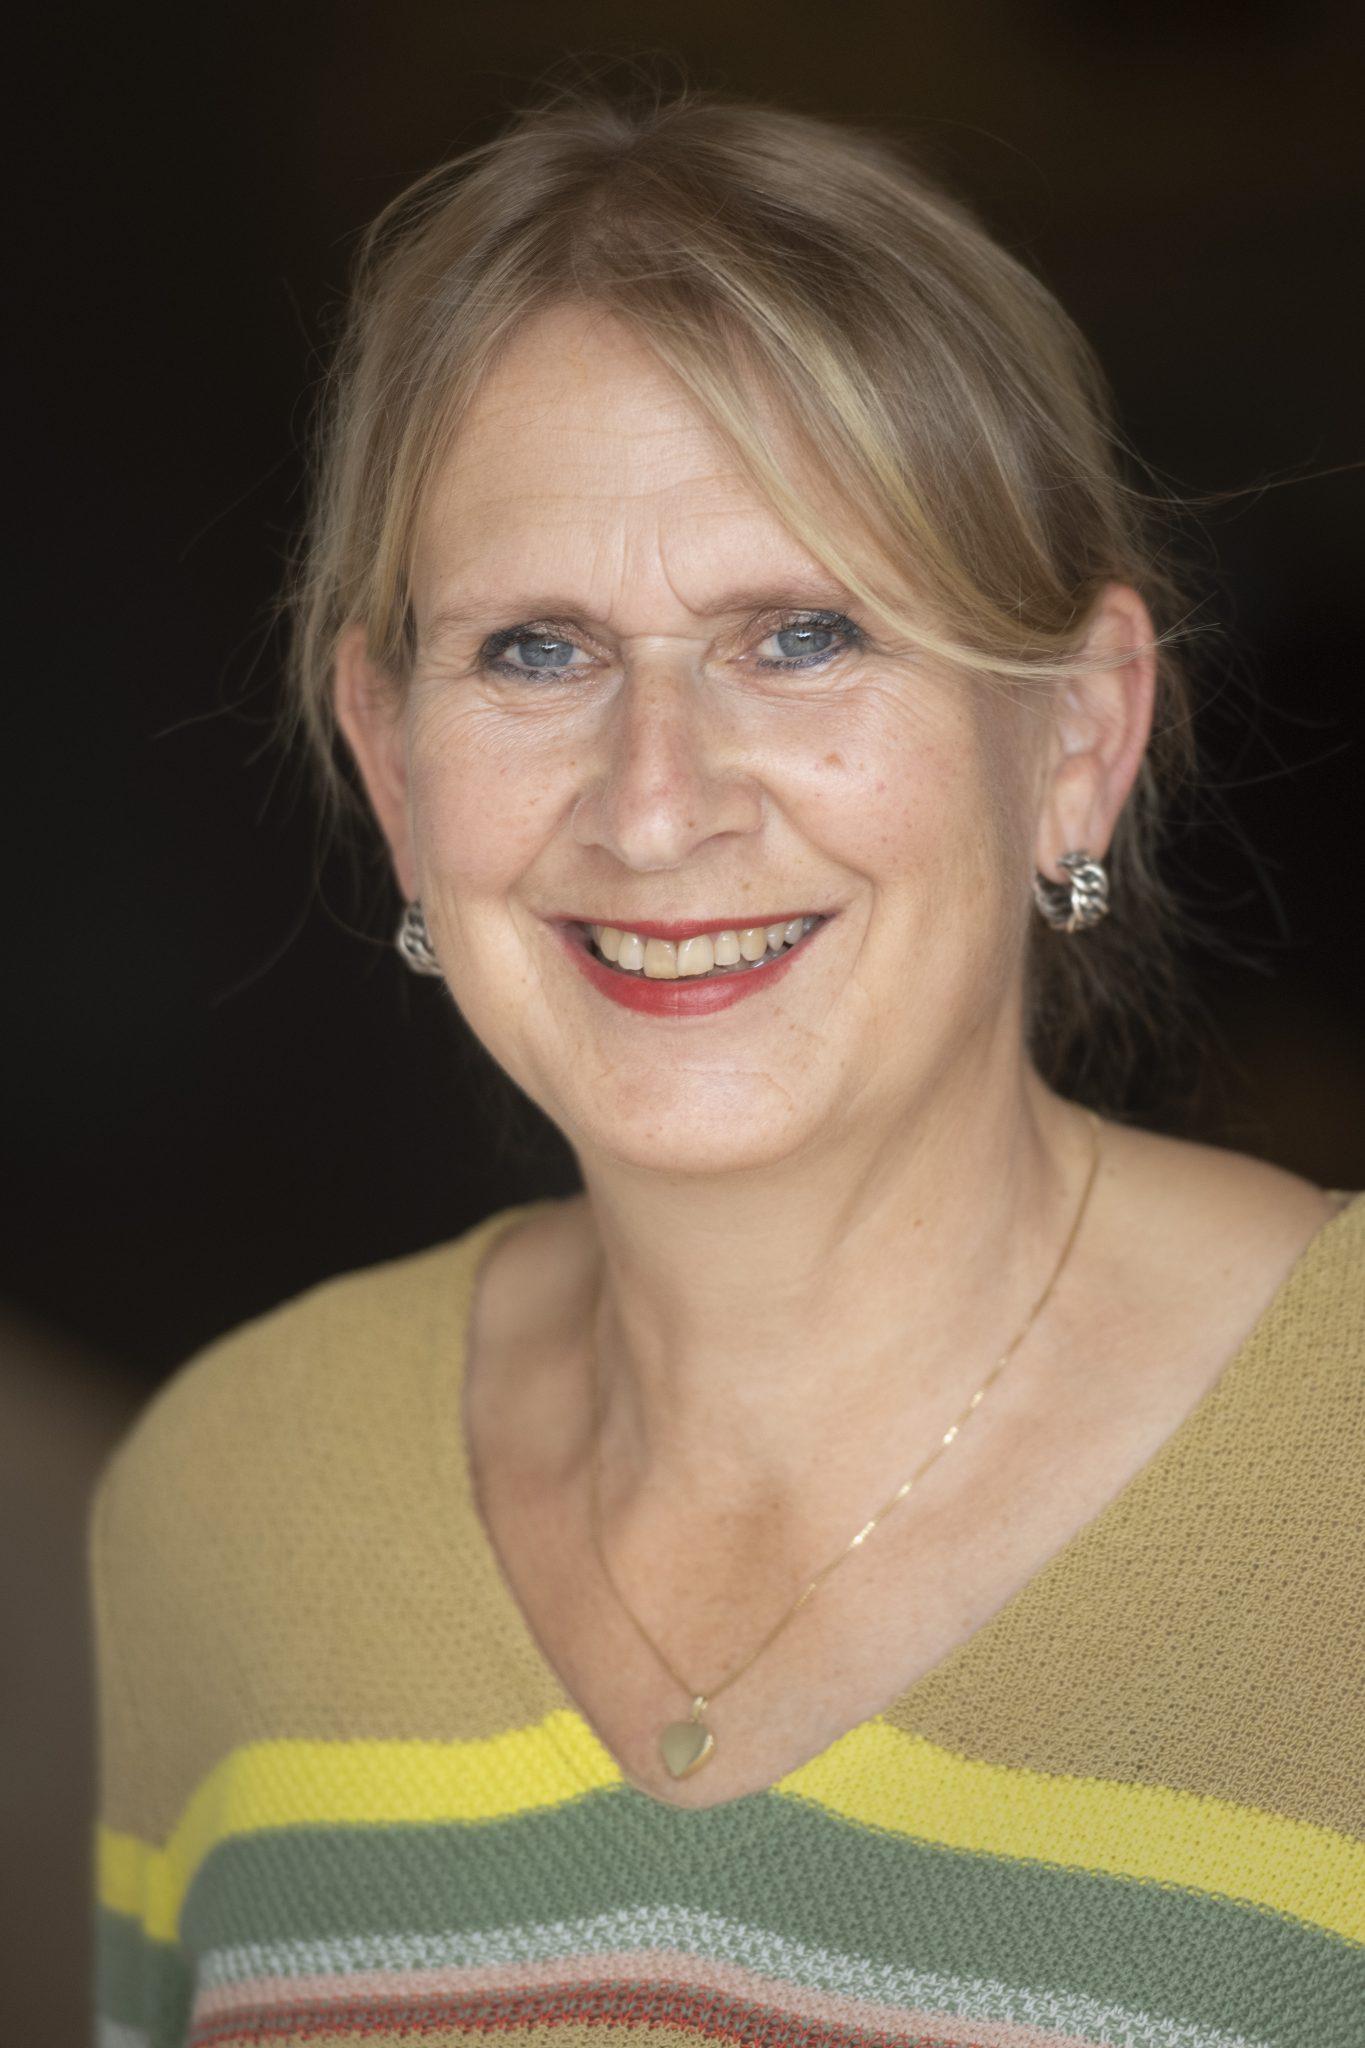 Mevrouw drs. A.J. (Annette) Offringa